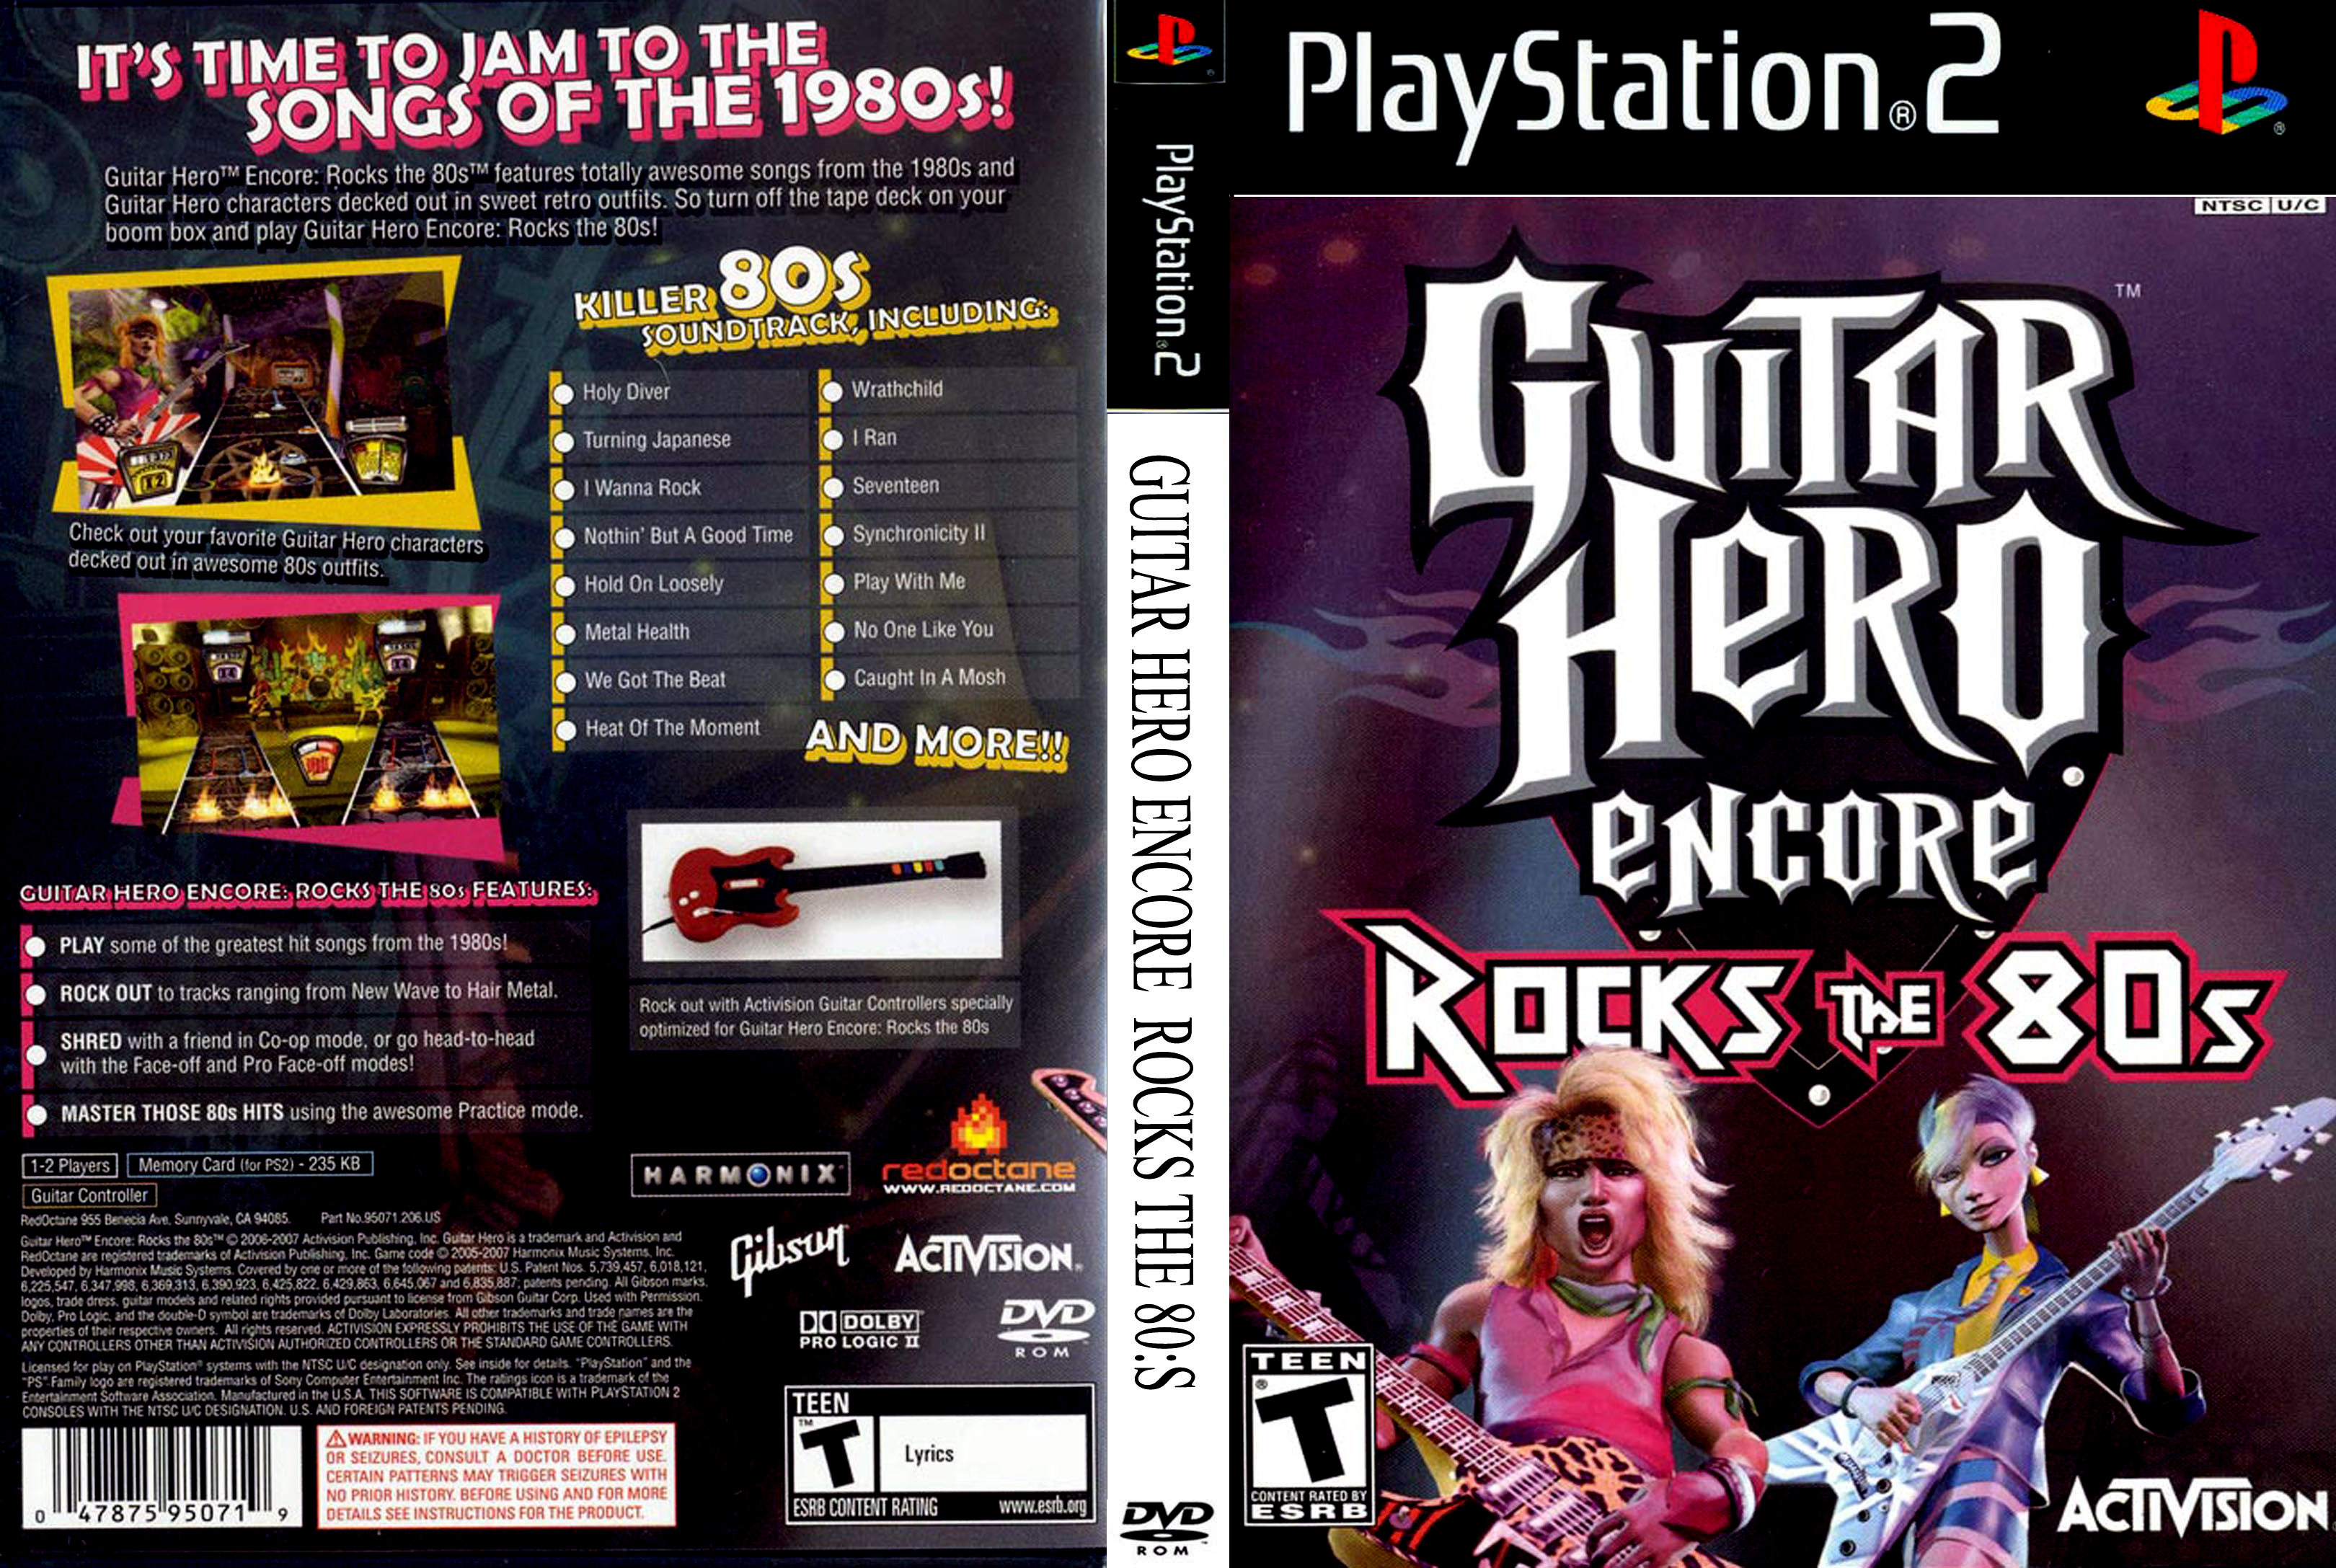 GuitarHeroEncoreRocksthe80s